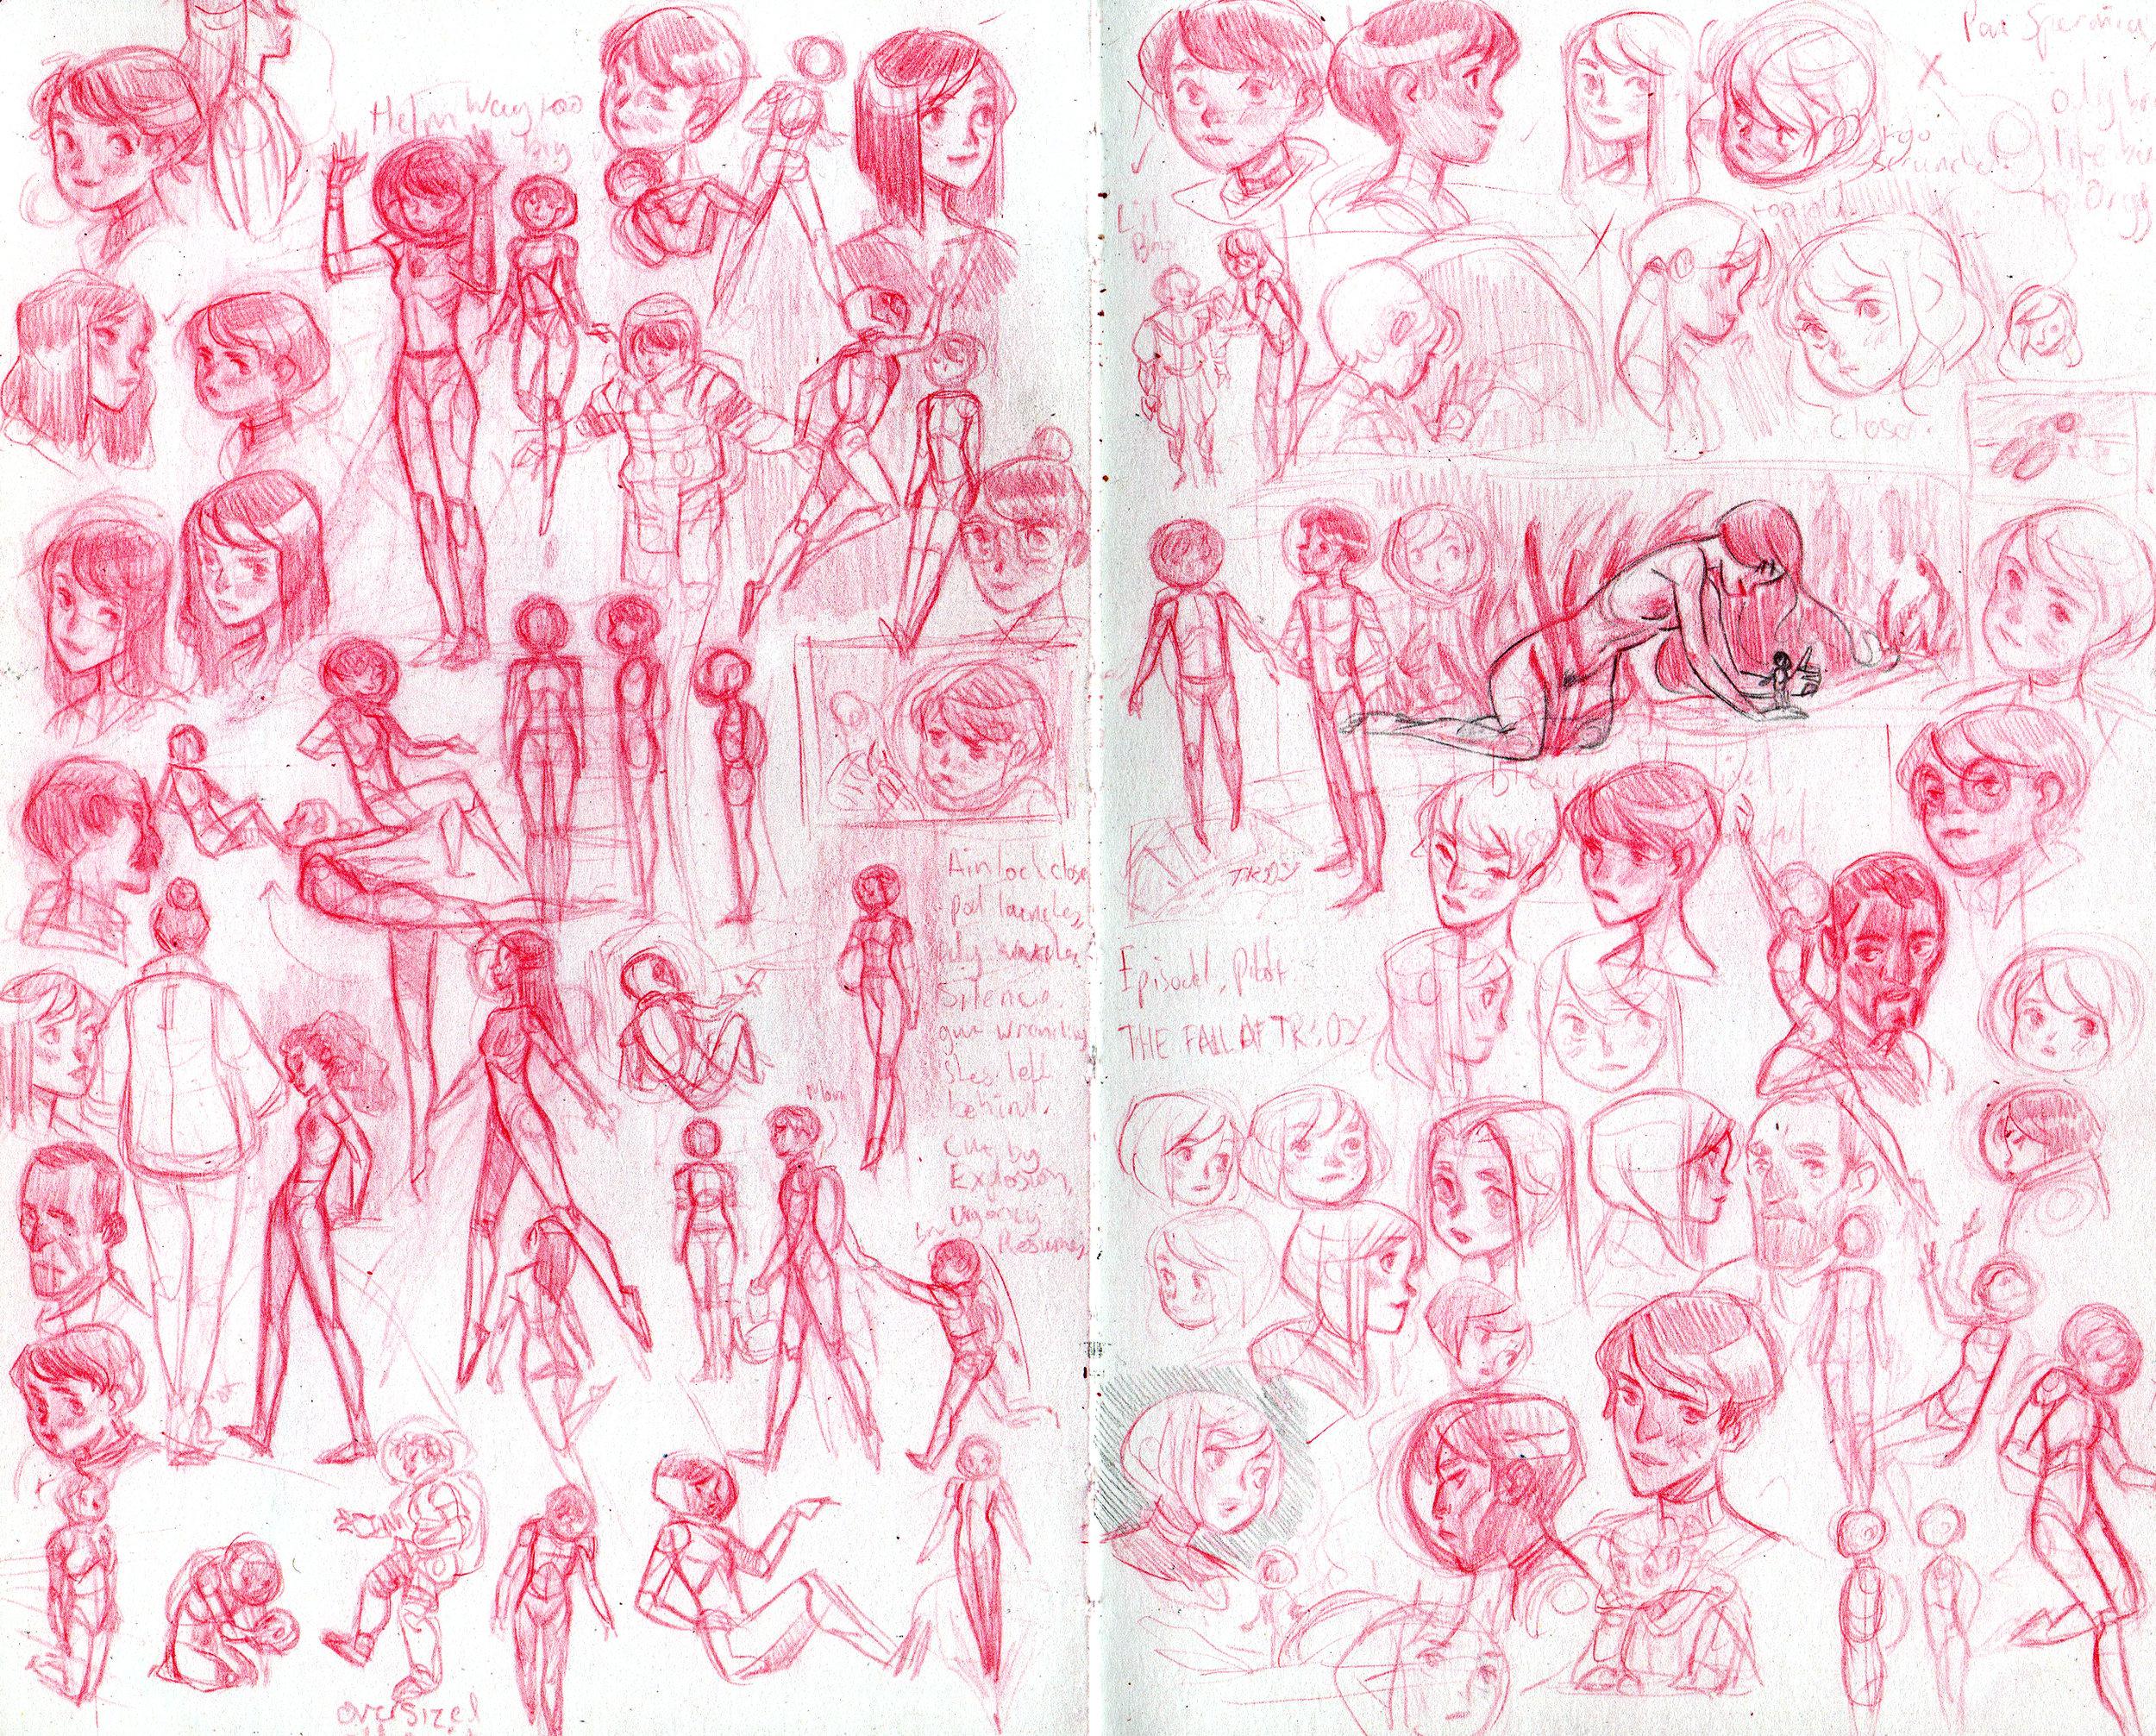 winter2018_2019 sketches3.jpg